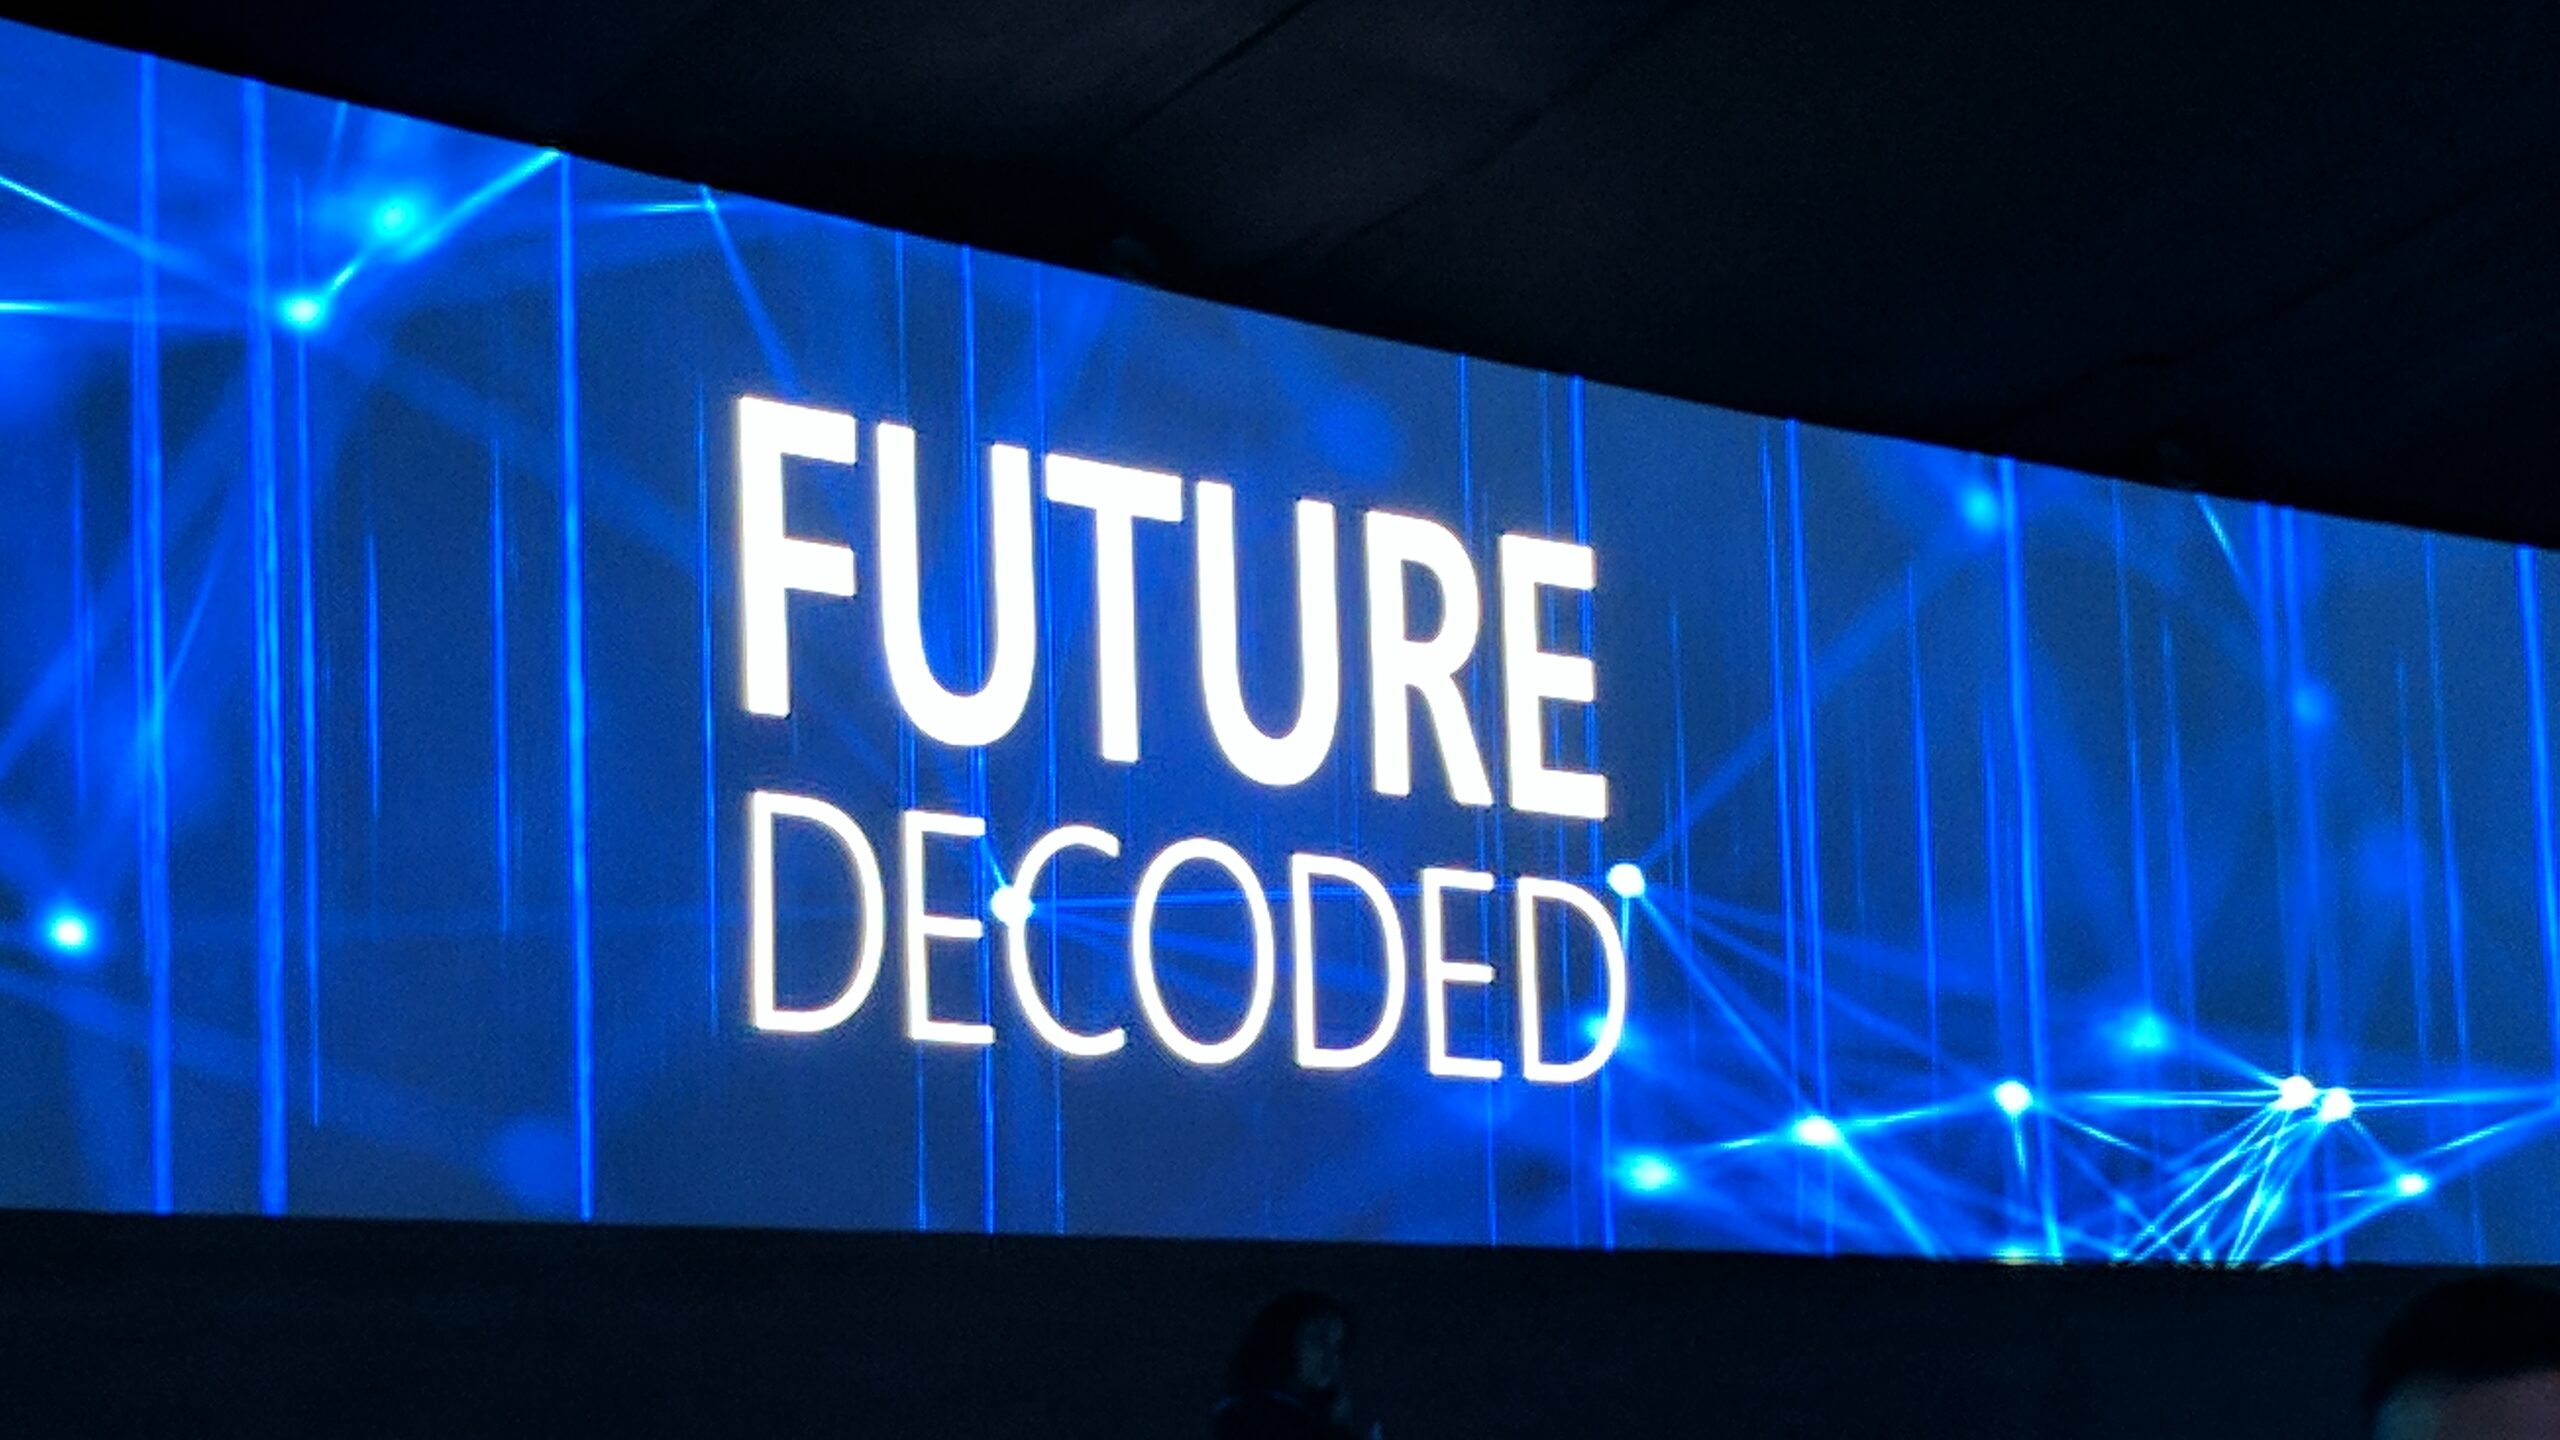 Microsoft's Future decoded event